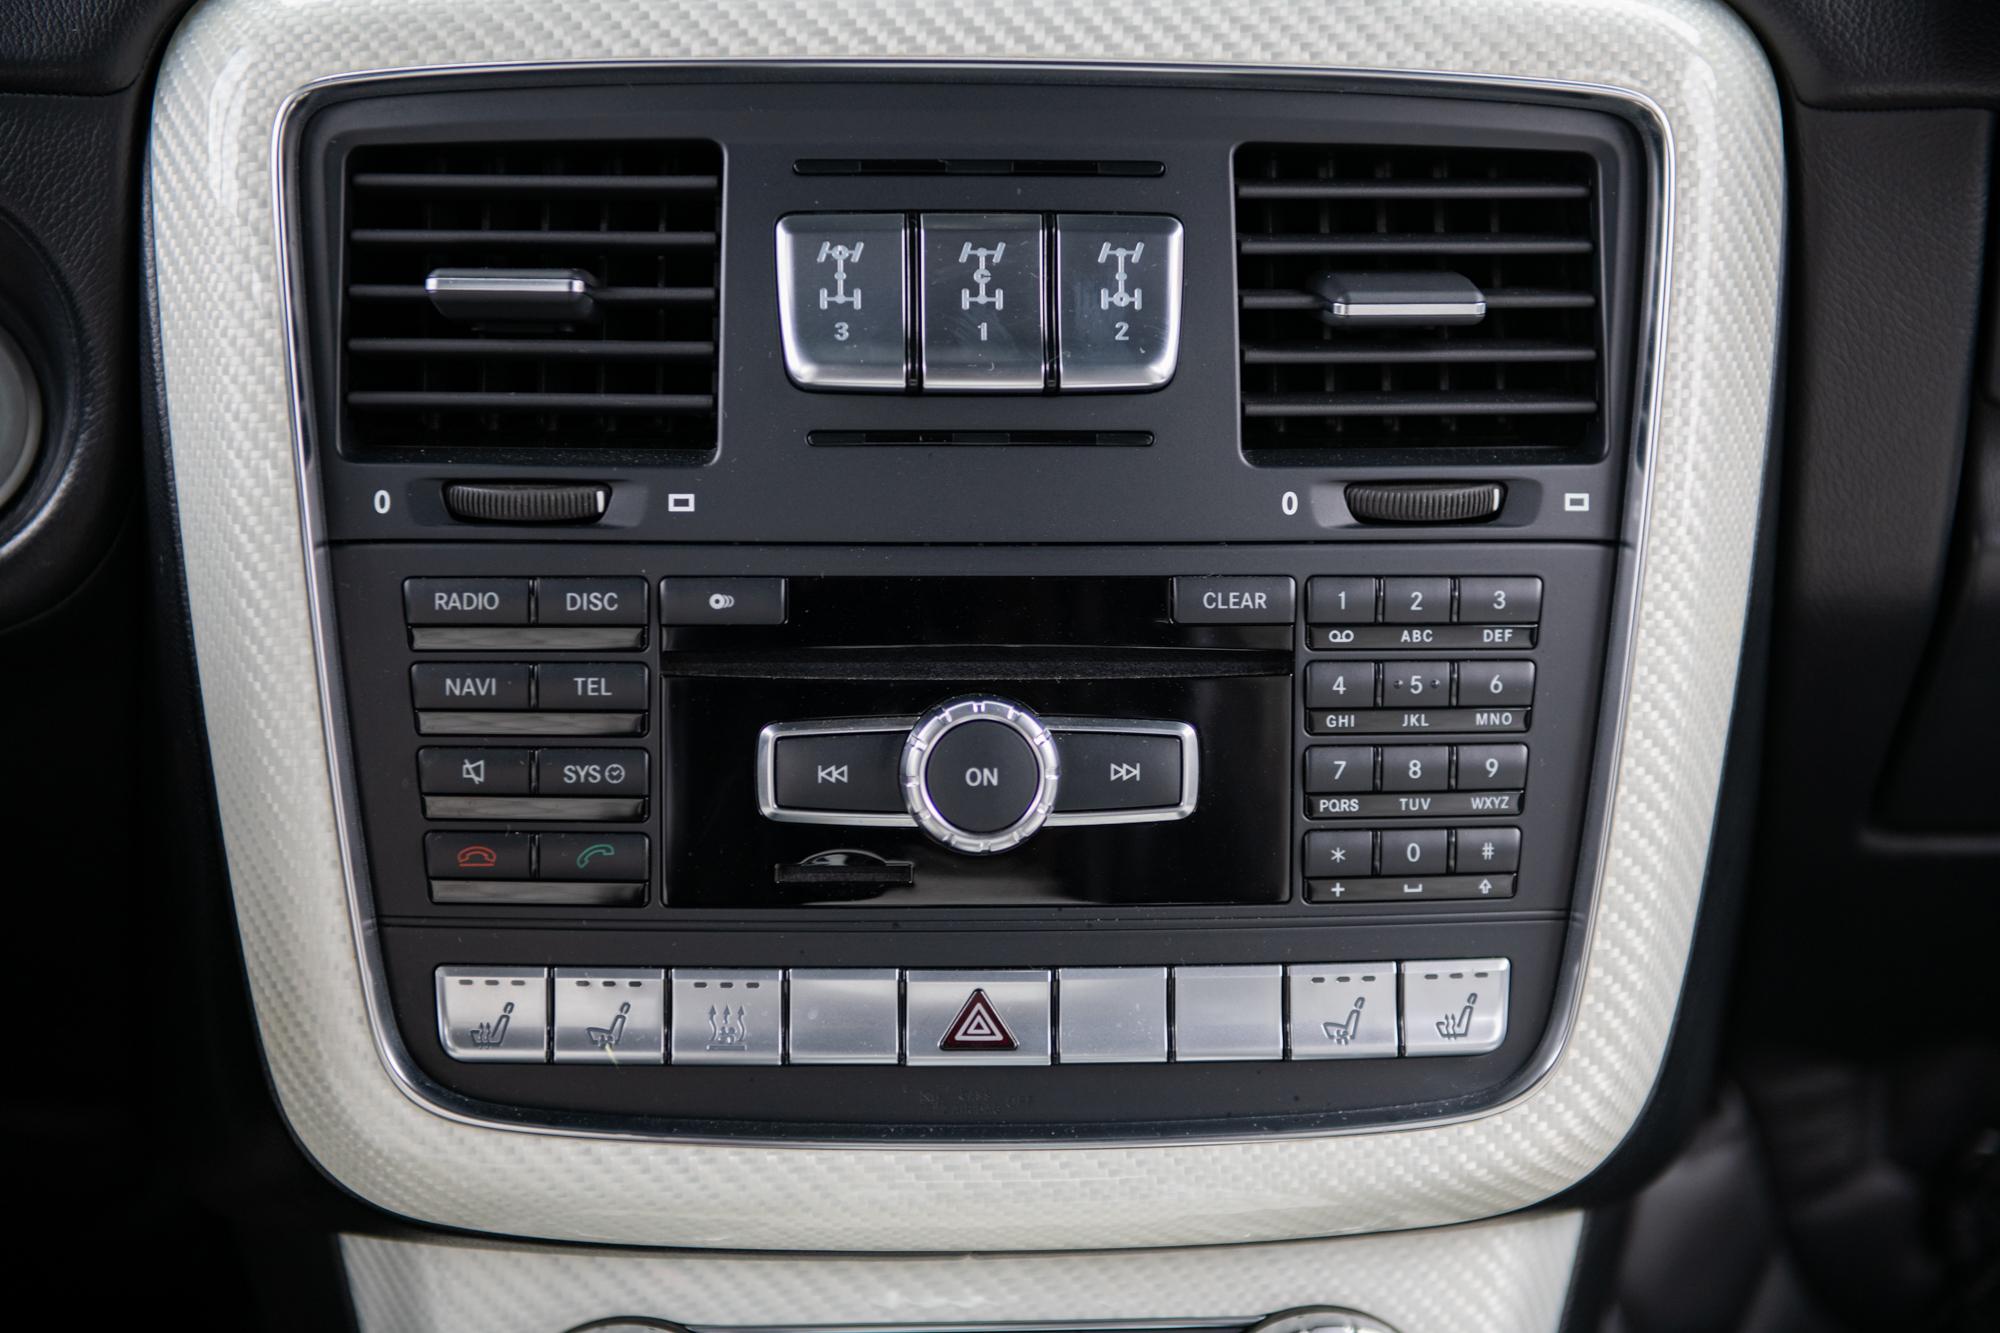 2014 Mercedes-AMG Brabus G63 6x6 , WHITE, VIN WDB4632721X219585, MILEAGE 7620